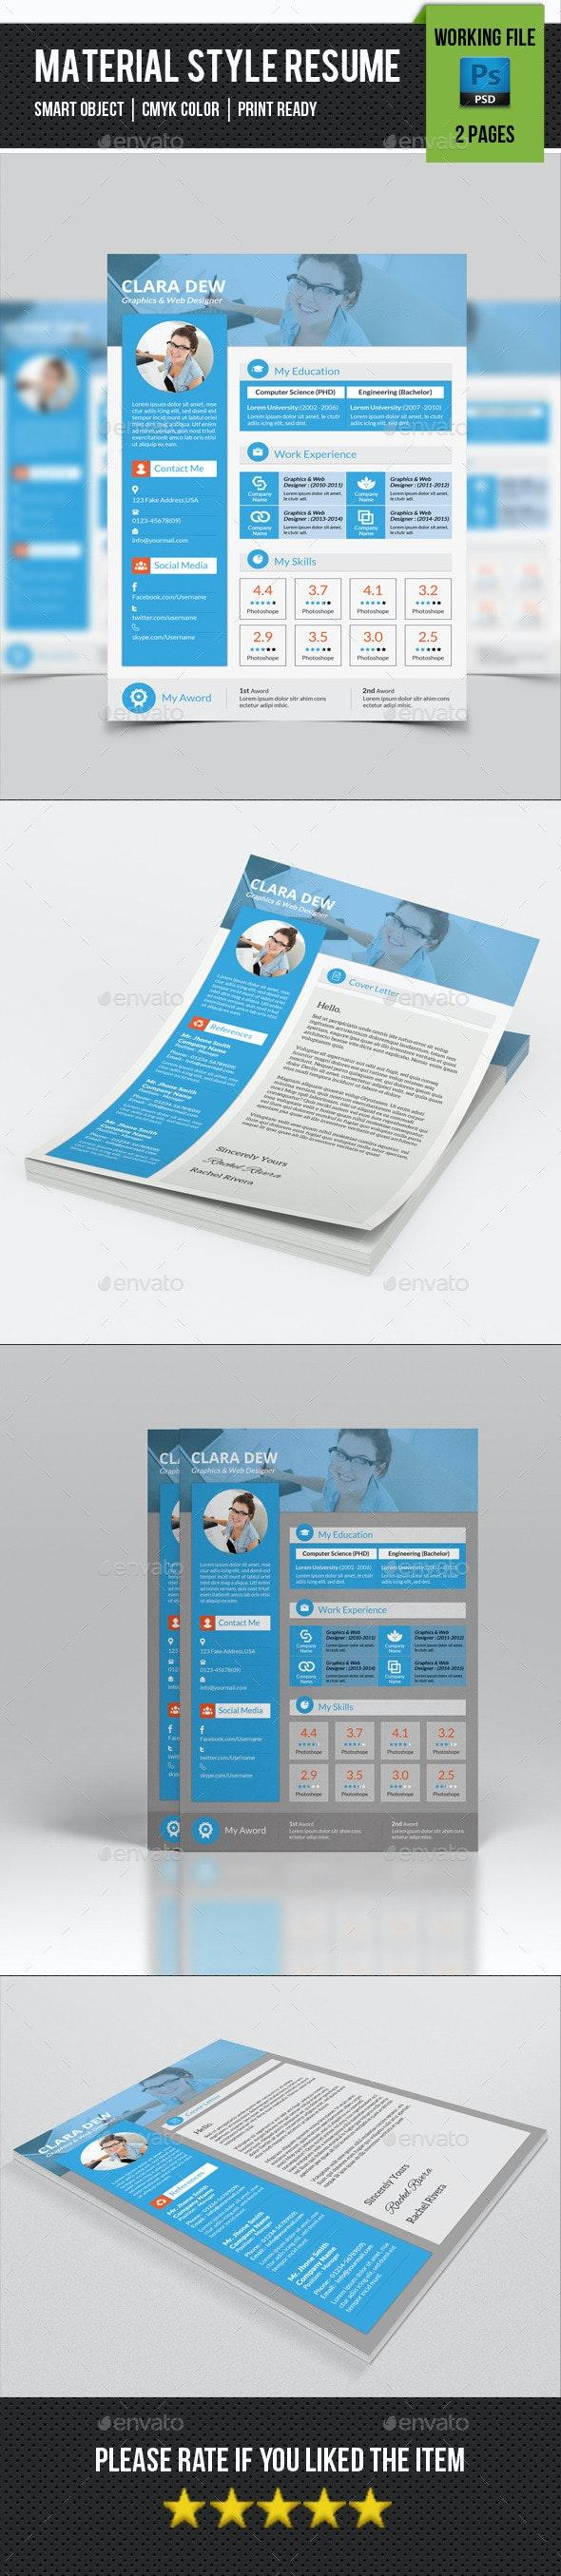 Creative Resume Template-V16 - Resumes Stationery